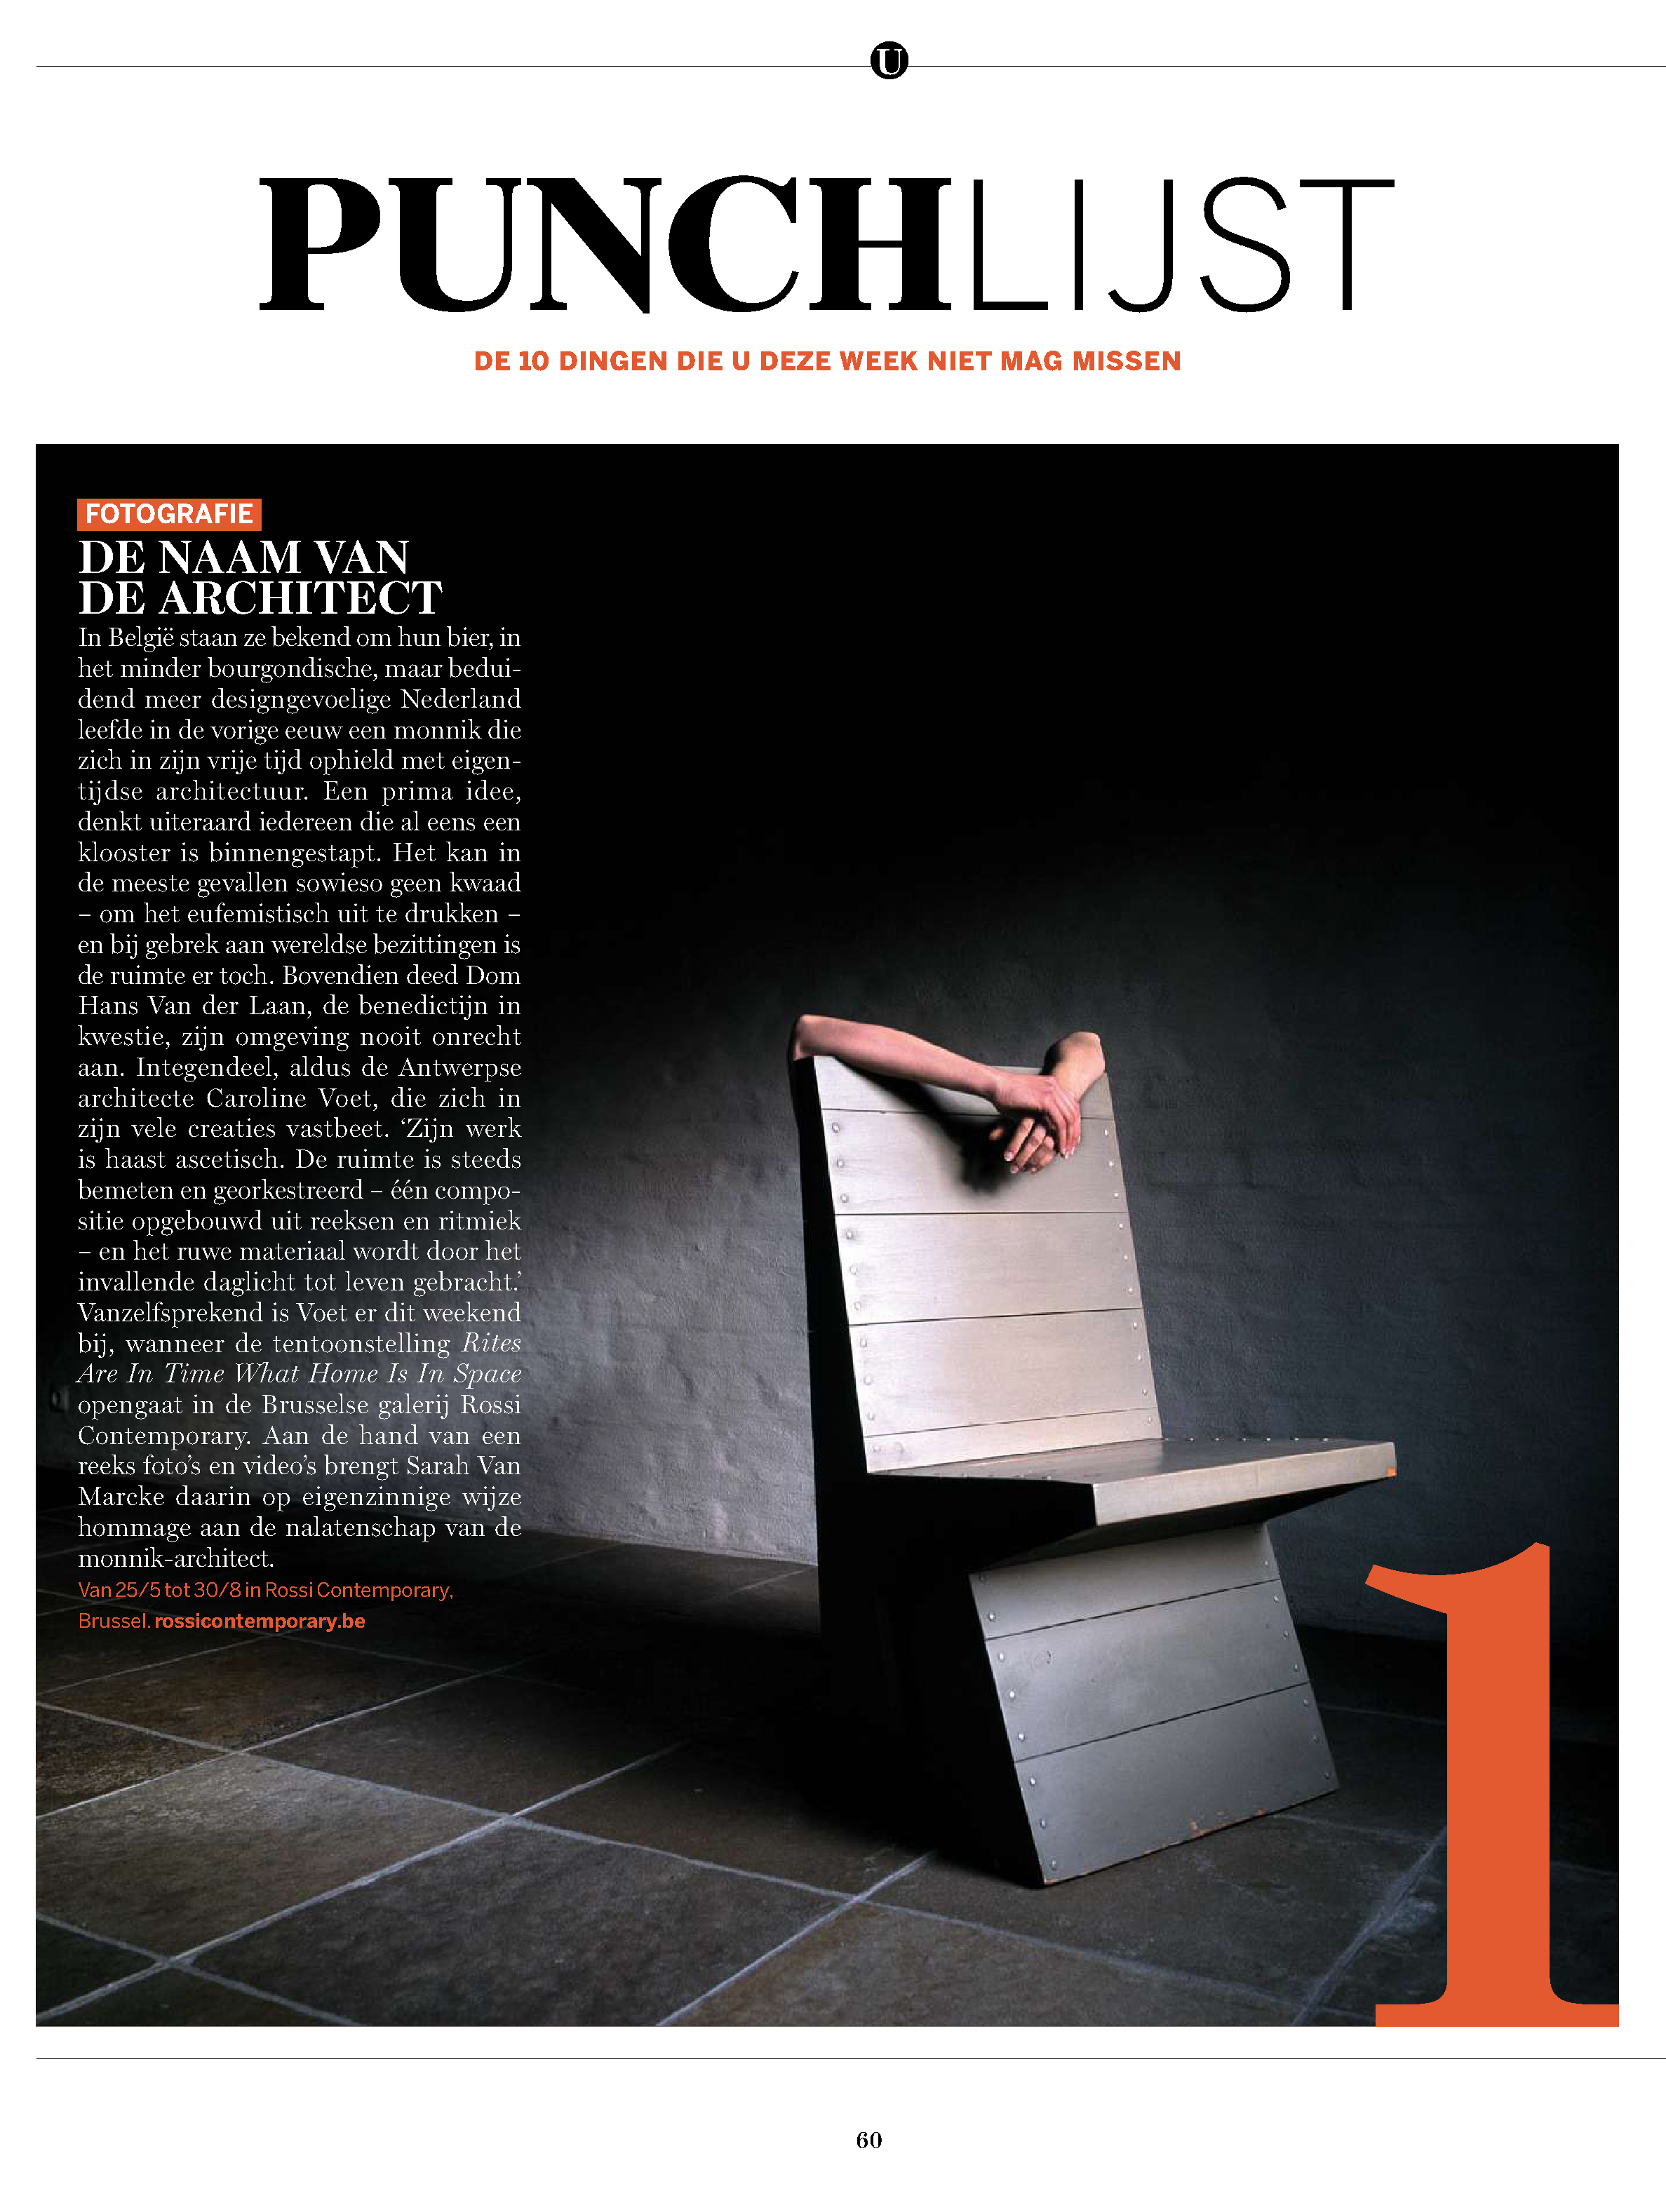 09 - De Standaard magazine 25-26-5-2013.jpg